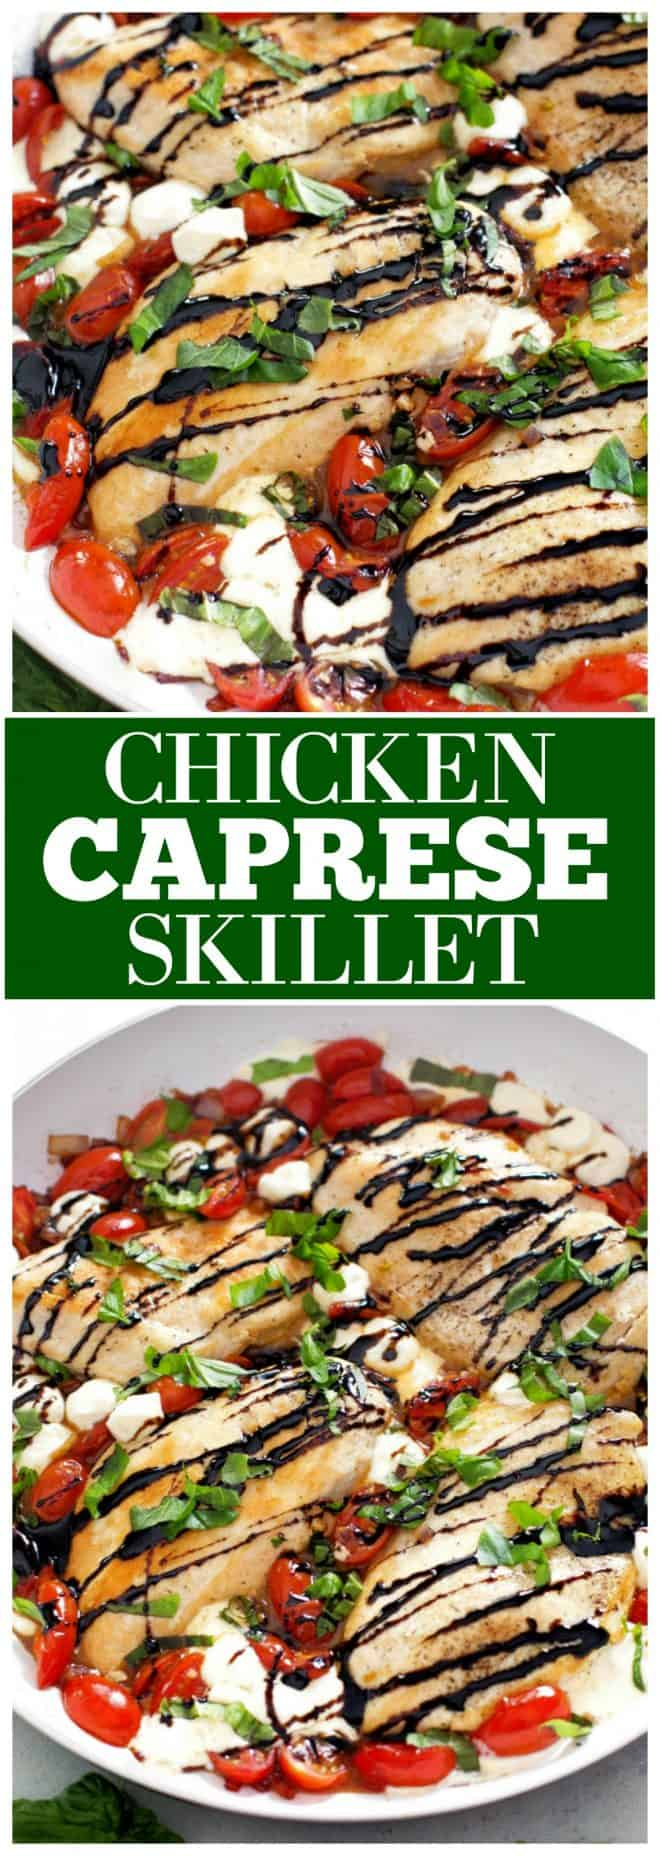 Caprese Chicken Skillet